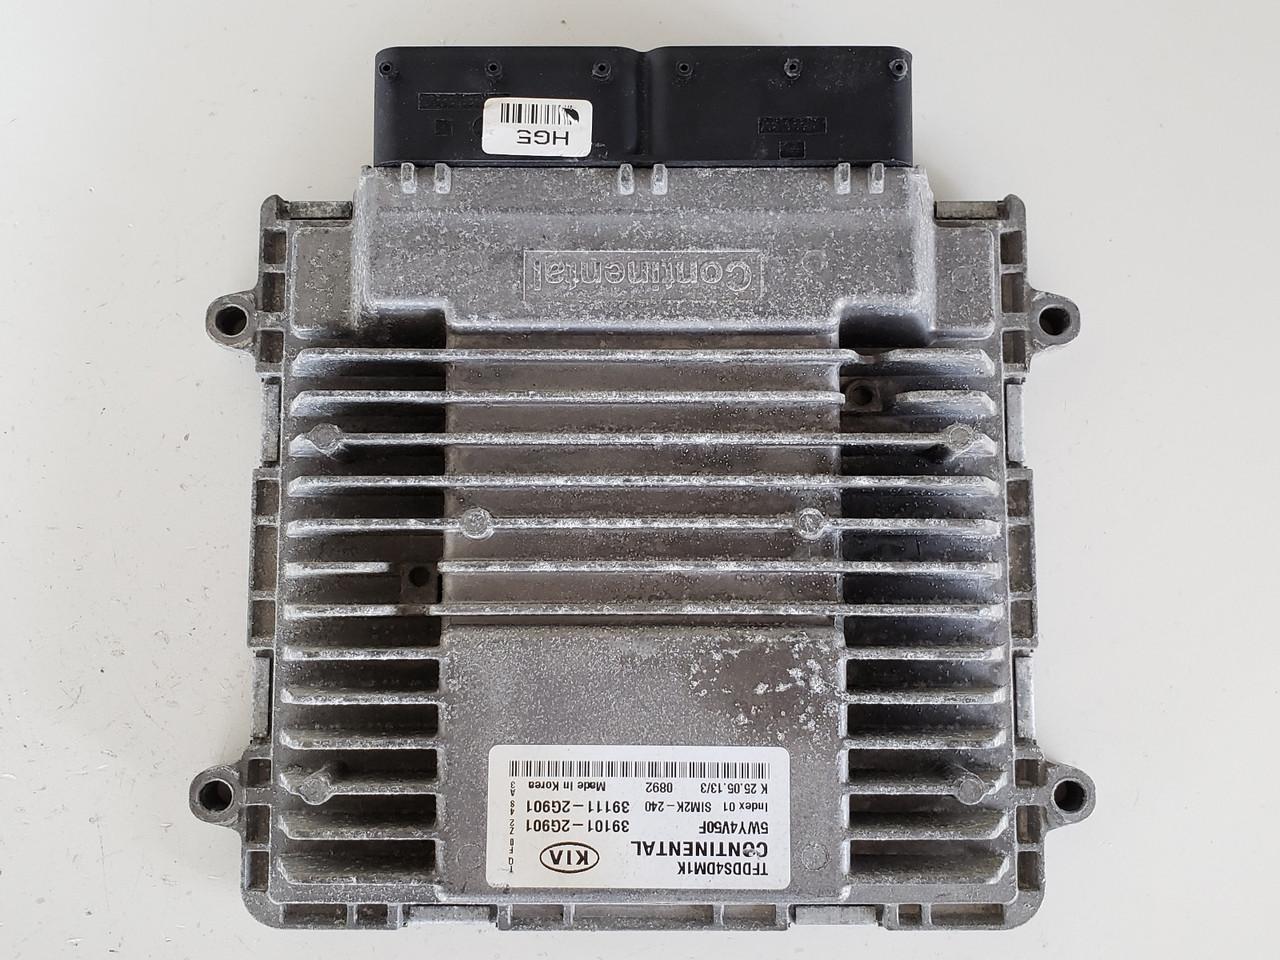 2013 Kia Optima 39111-2G901 Computer Brain Engine Control ECU ECM EBX Module